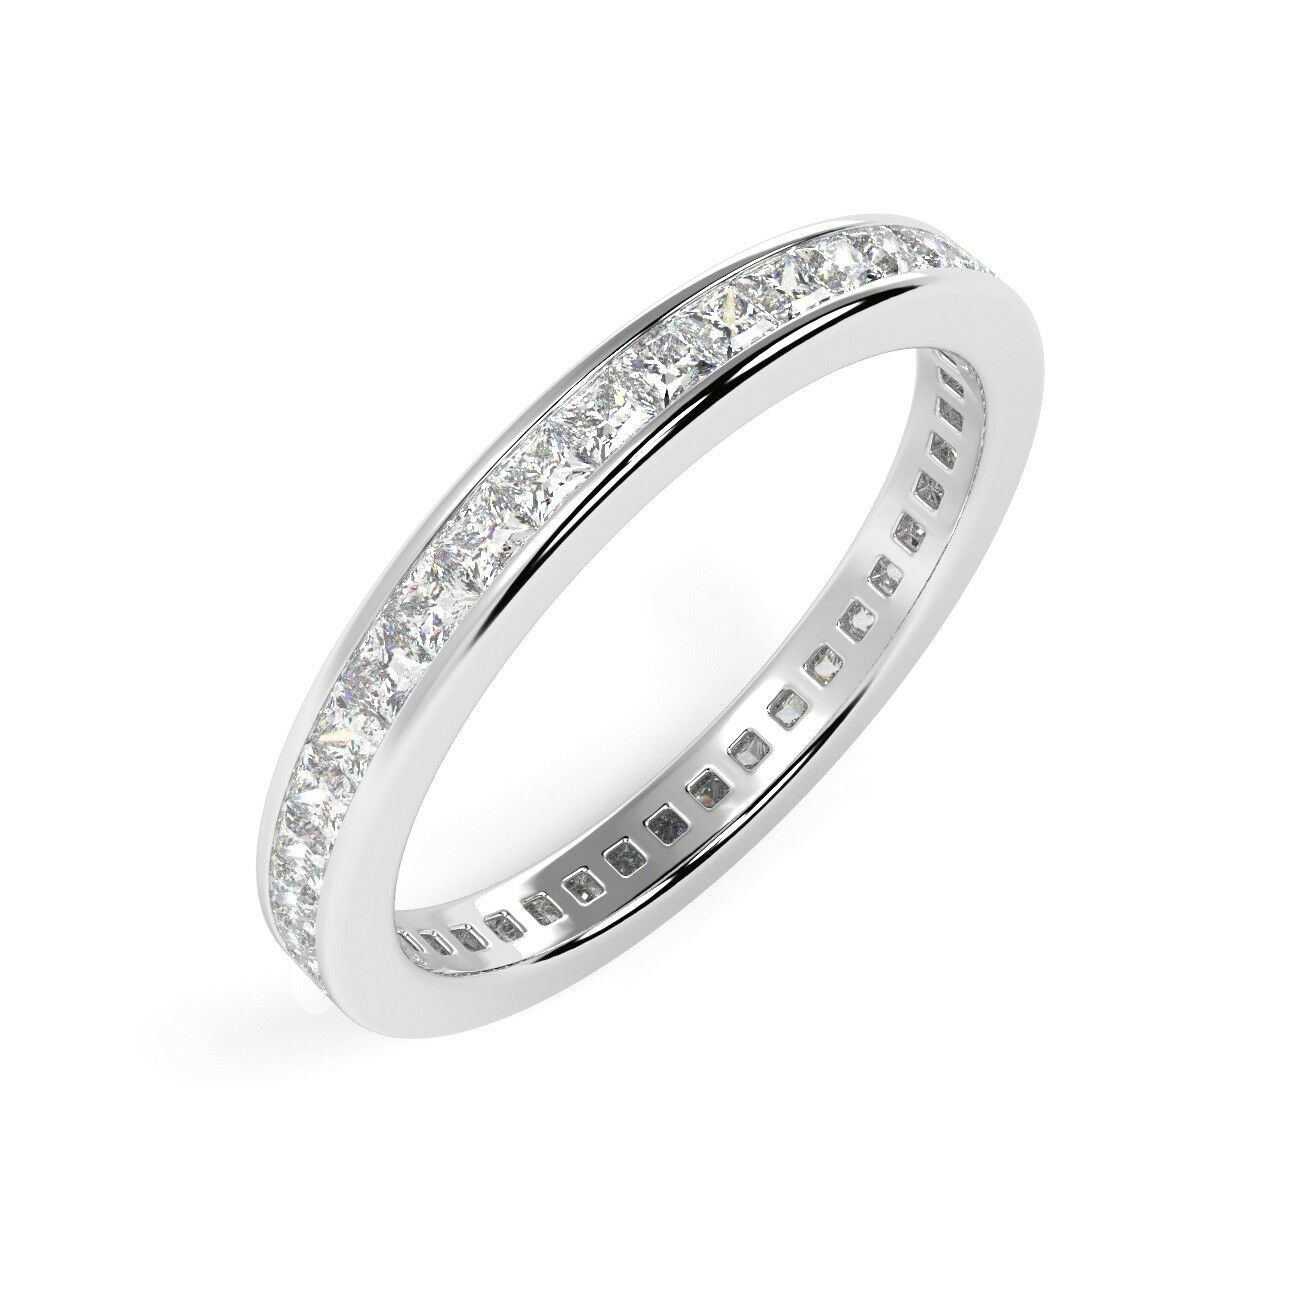 86849d703 1.00 Princess Diamond Channel Set Full Eternity Ring, 18K White gold Ct  Natural nriujq3235-Diamond